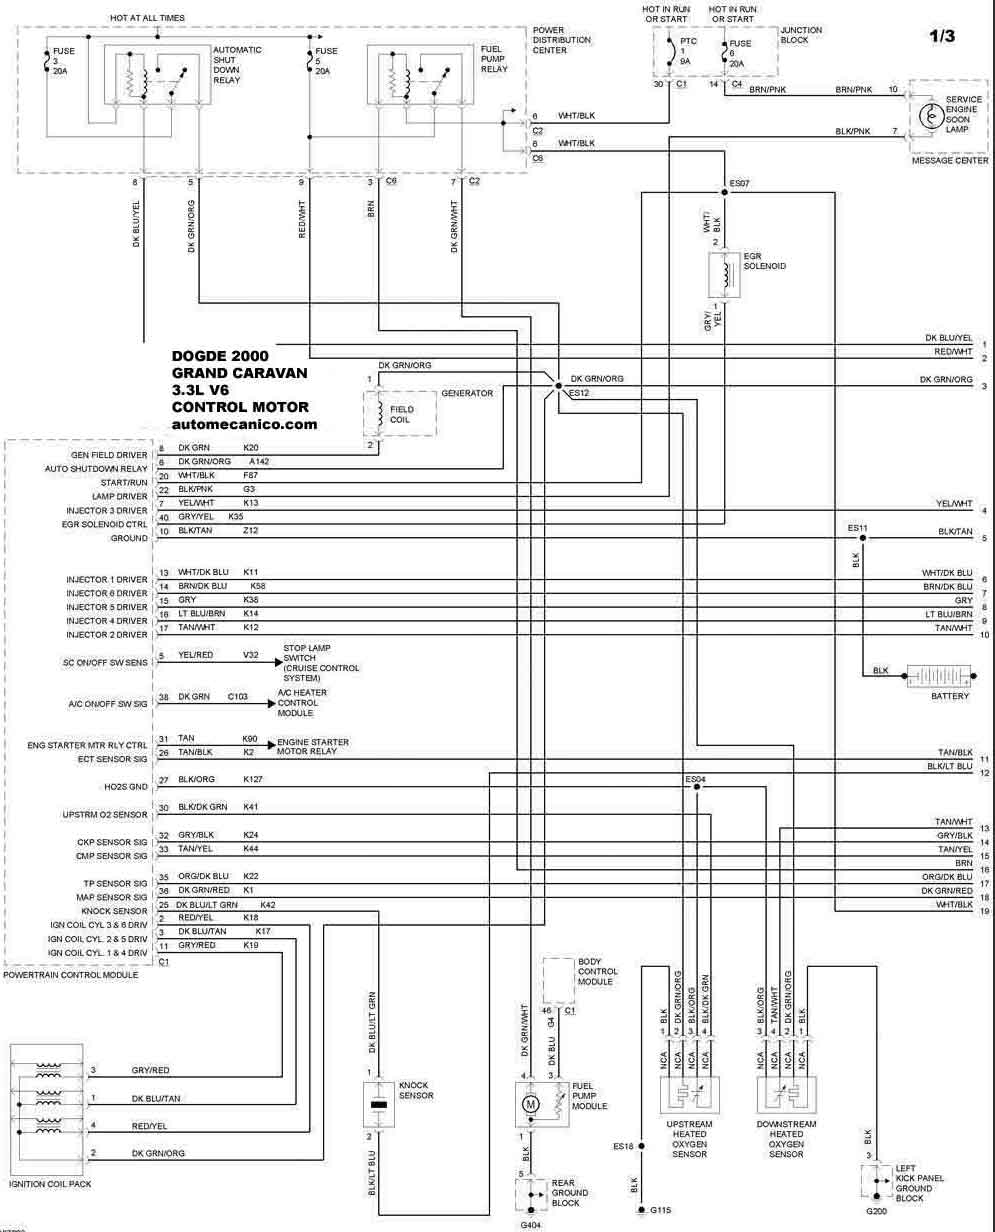 2000 dodge grand caravan Diagrama del motor